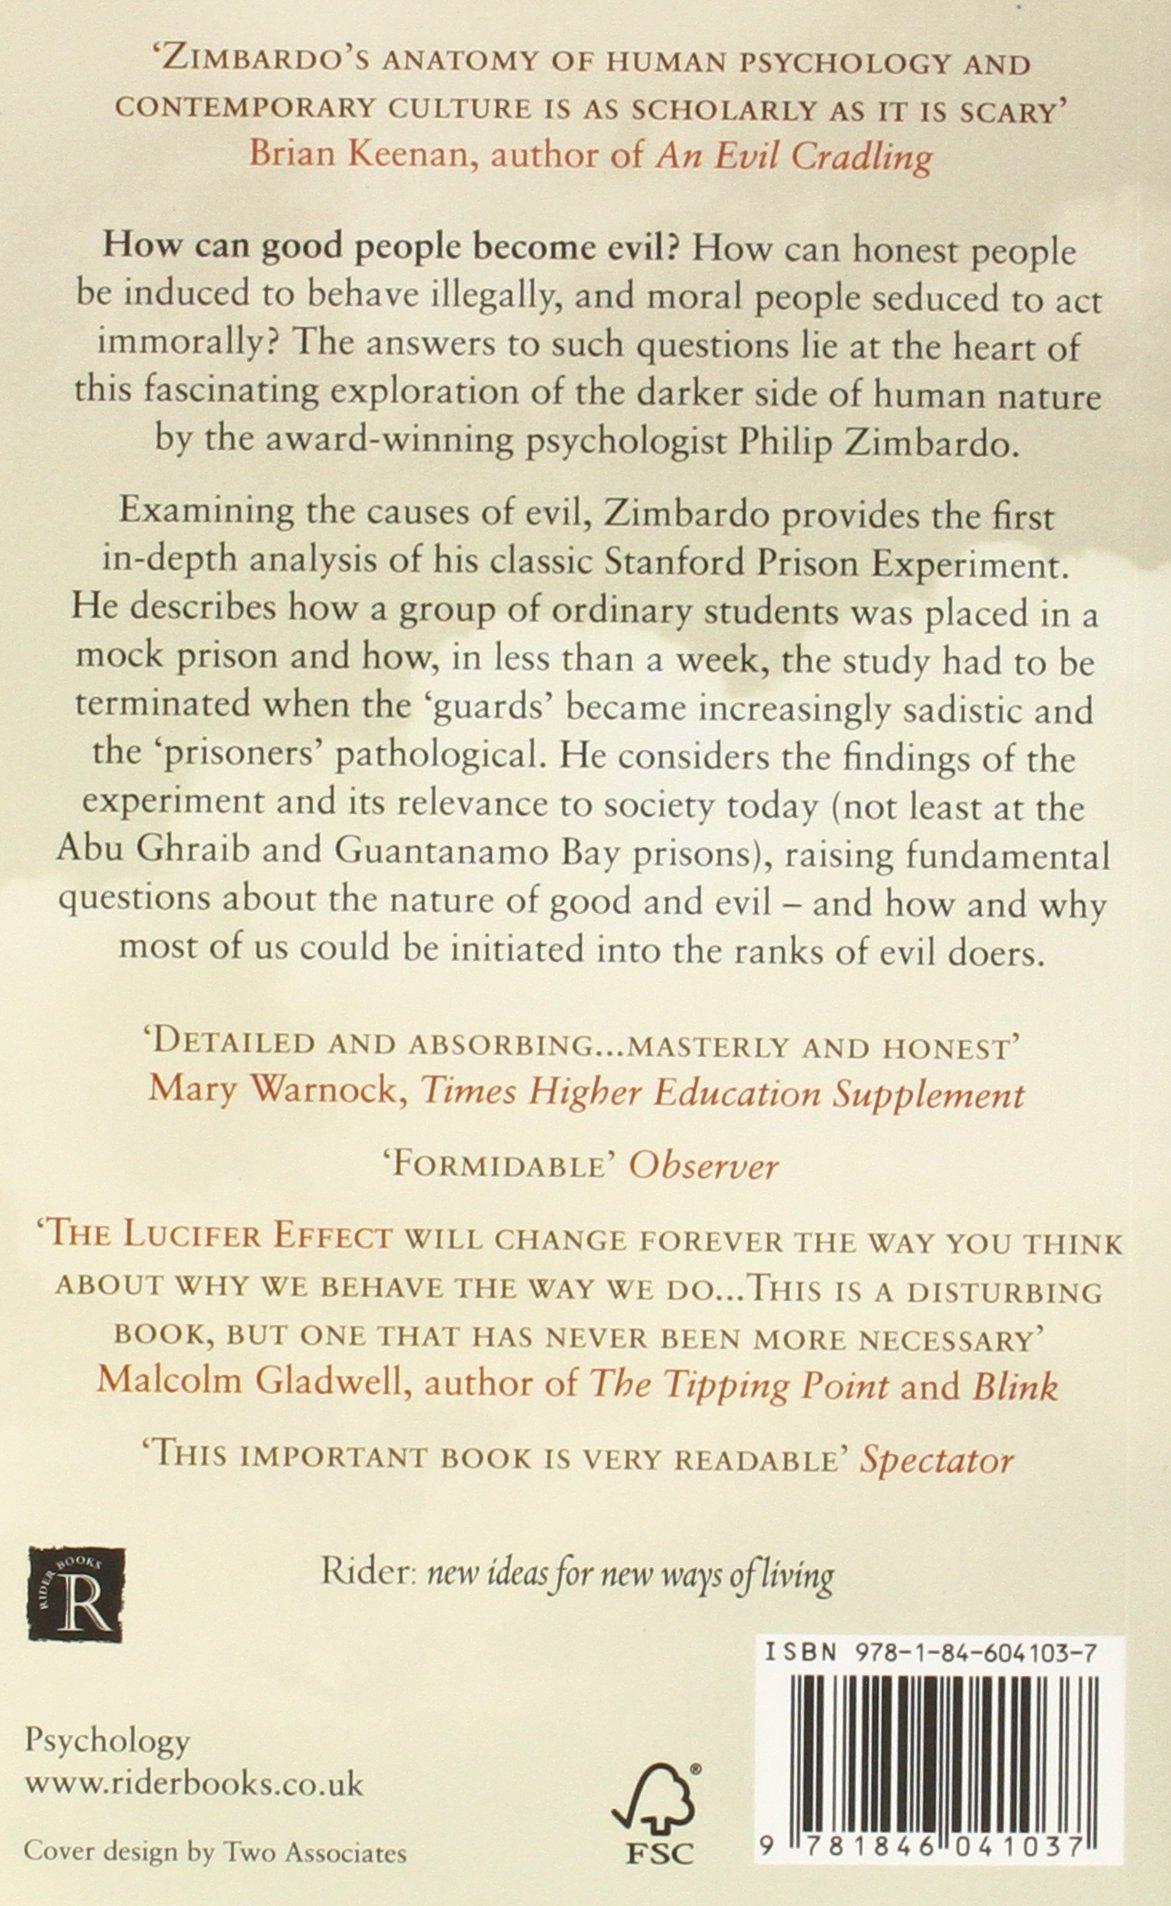 The Lucifer Effect: How Good People Turn Evil: Amazon.es: Philip Zimbardo: Libros en idiomas extranjeros